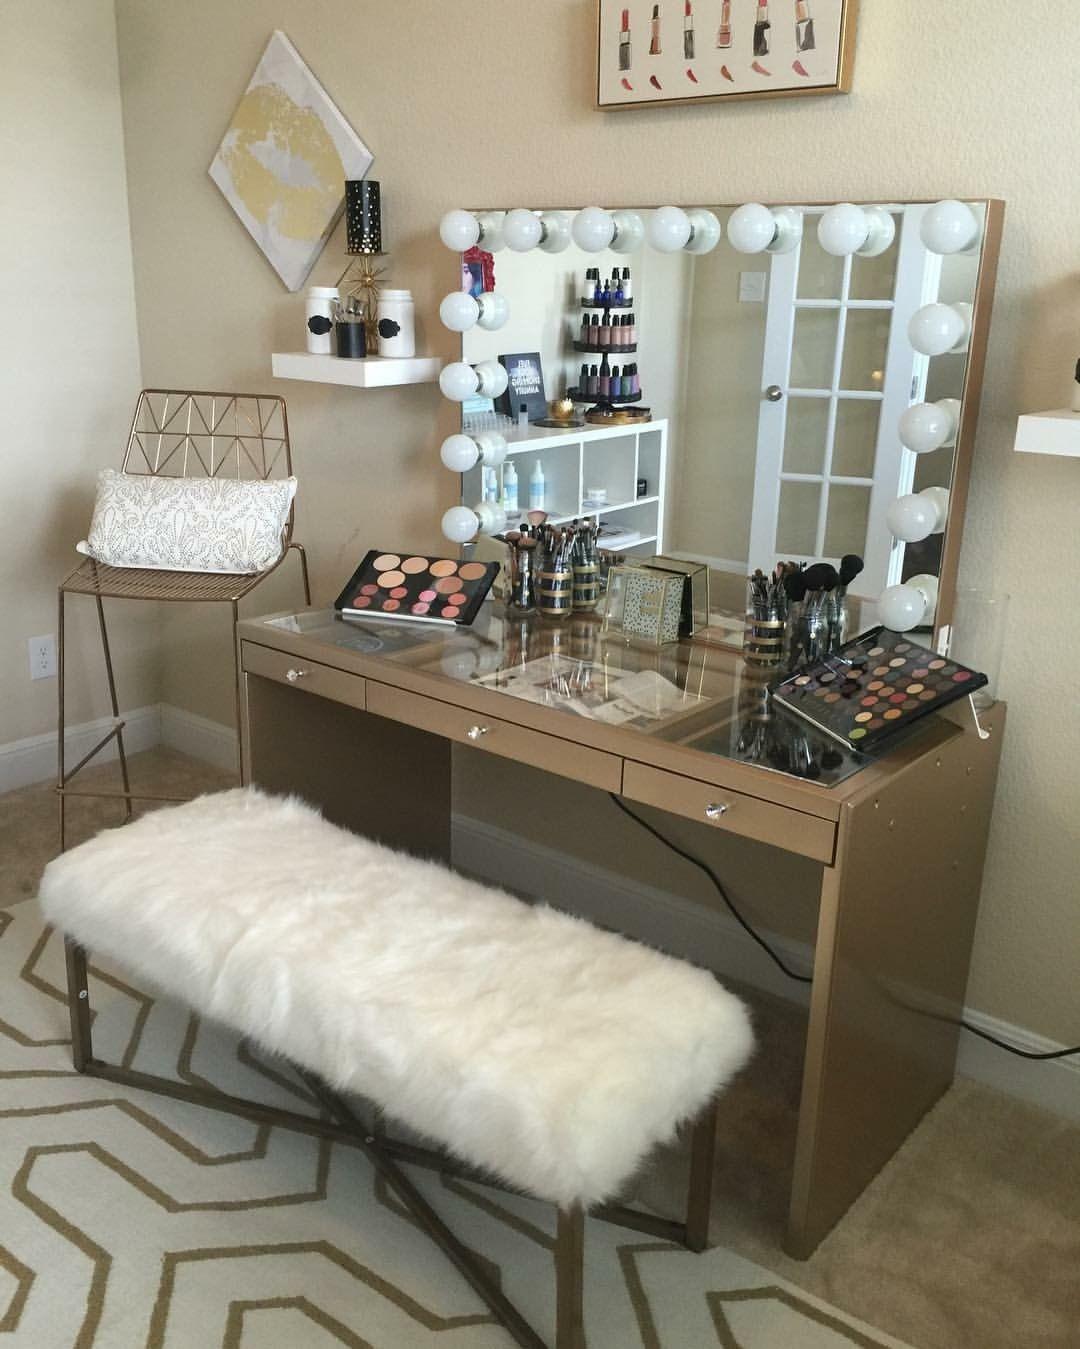 Pin by wanda lee on int decoration pinterest vanities bedrooms